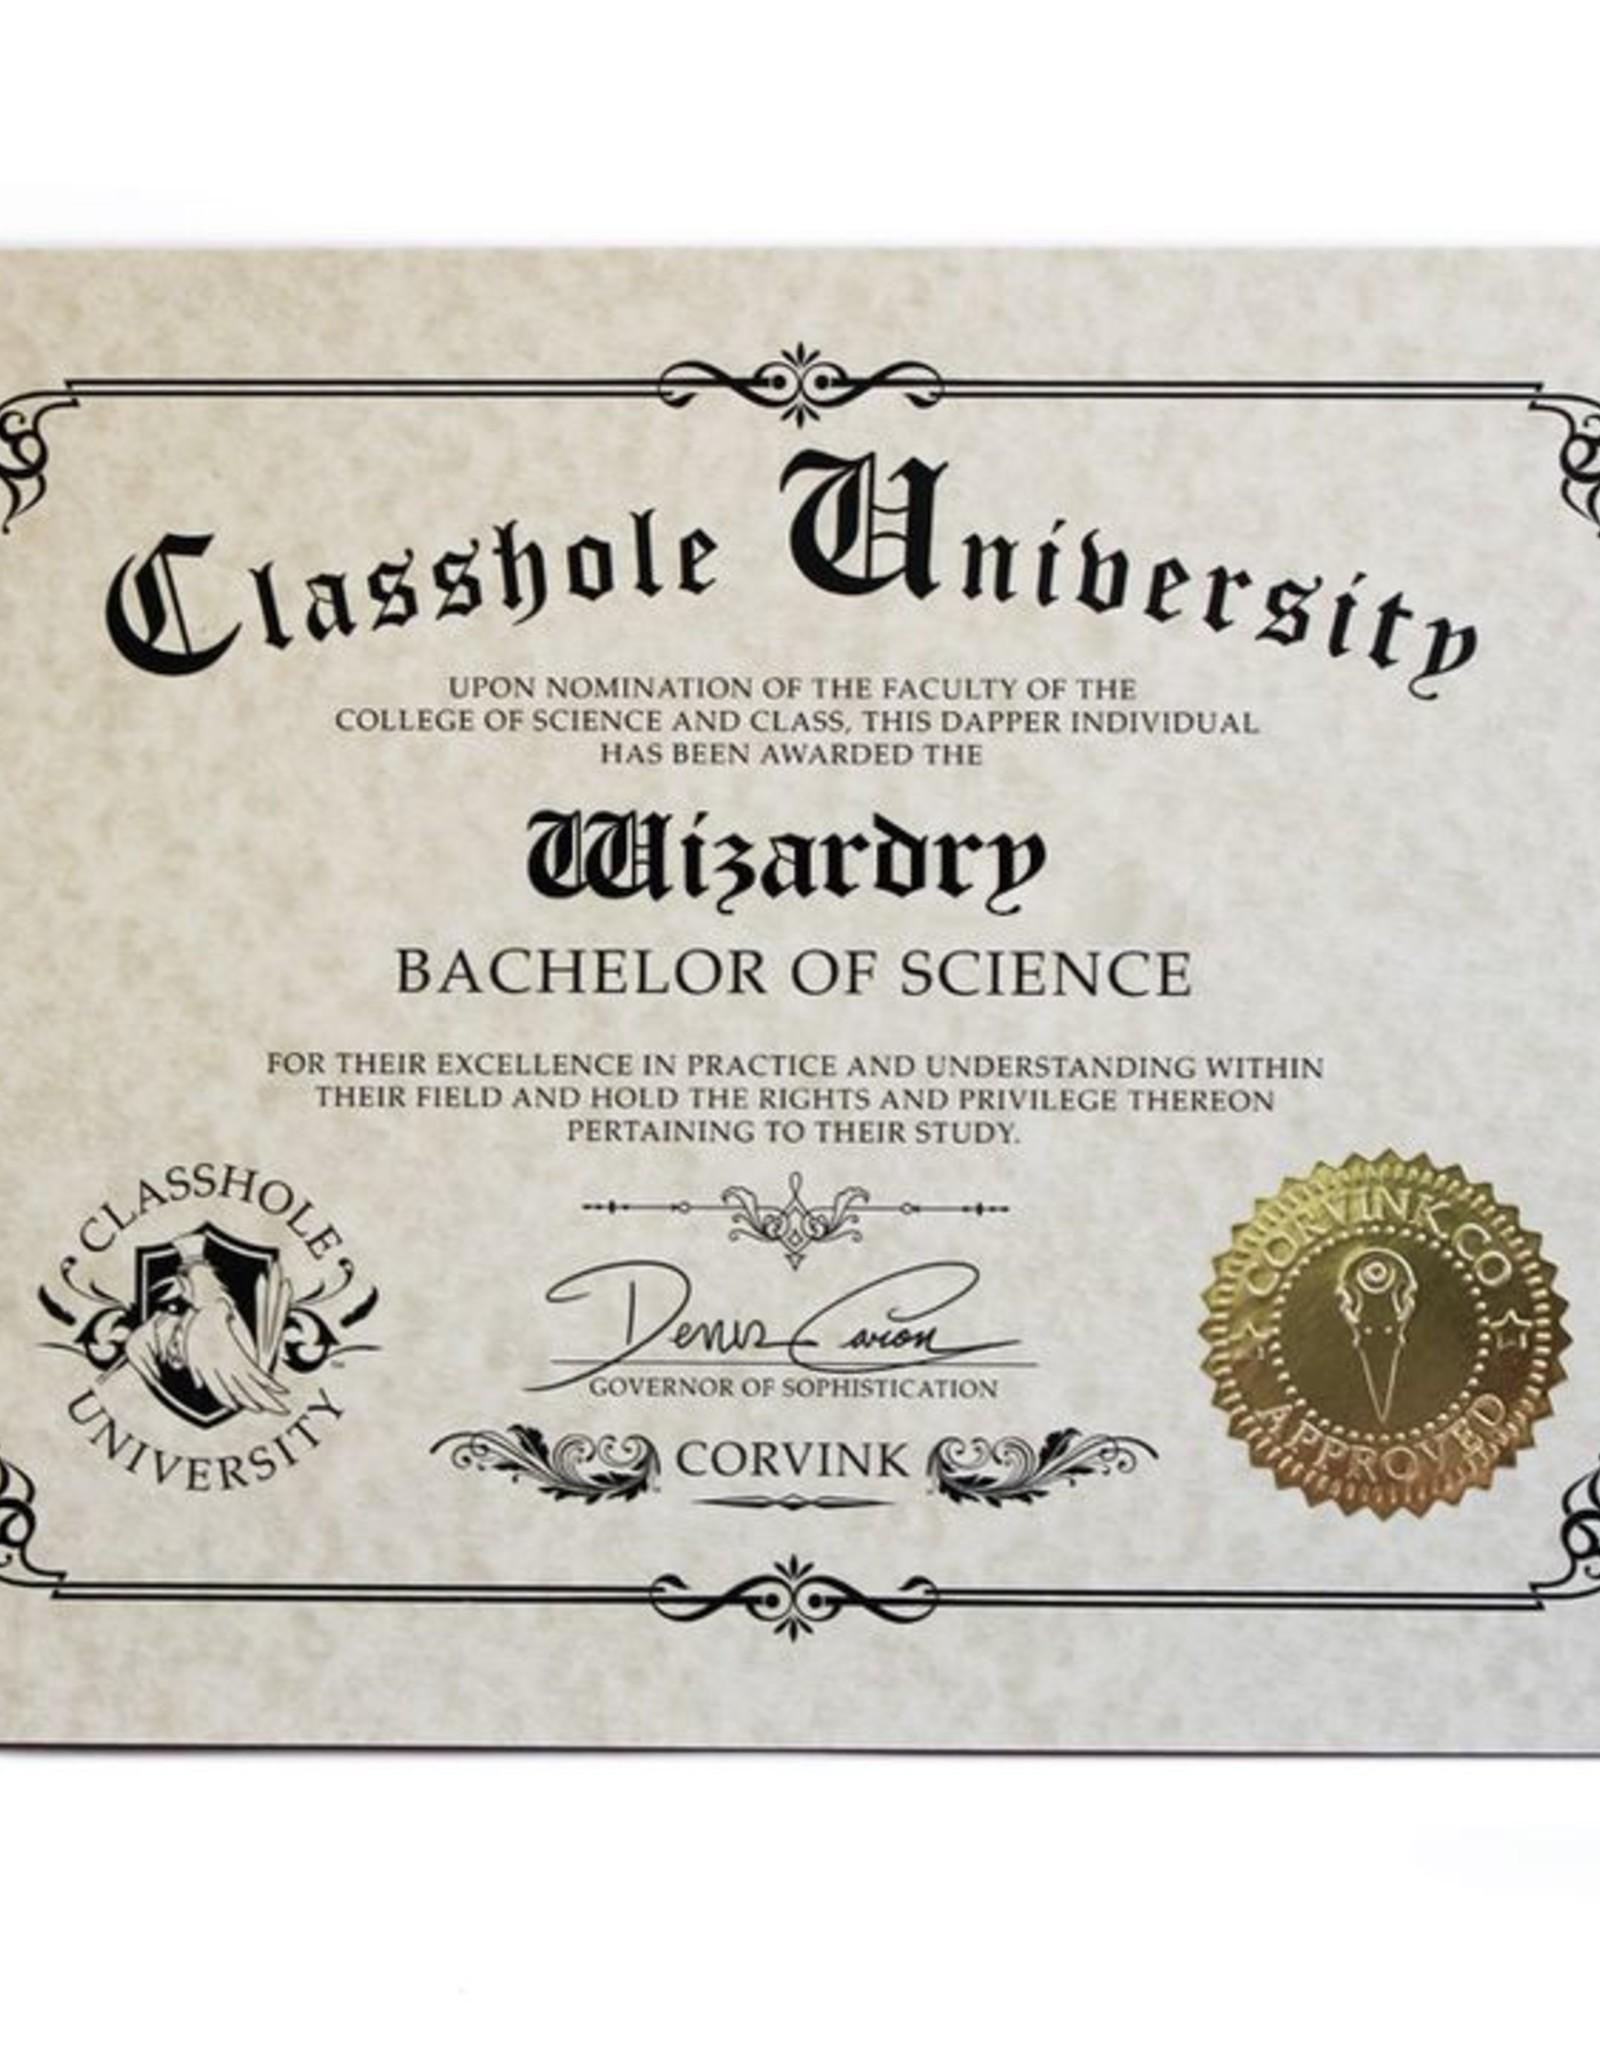 Classhole University BS Diplomas - Wizardry